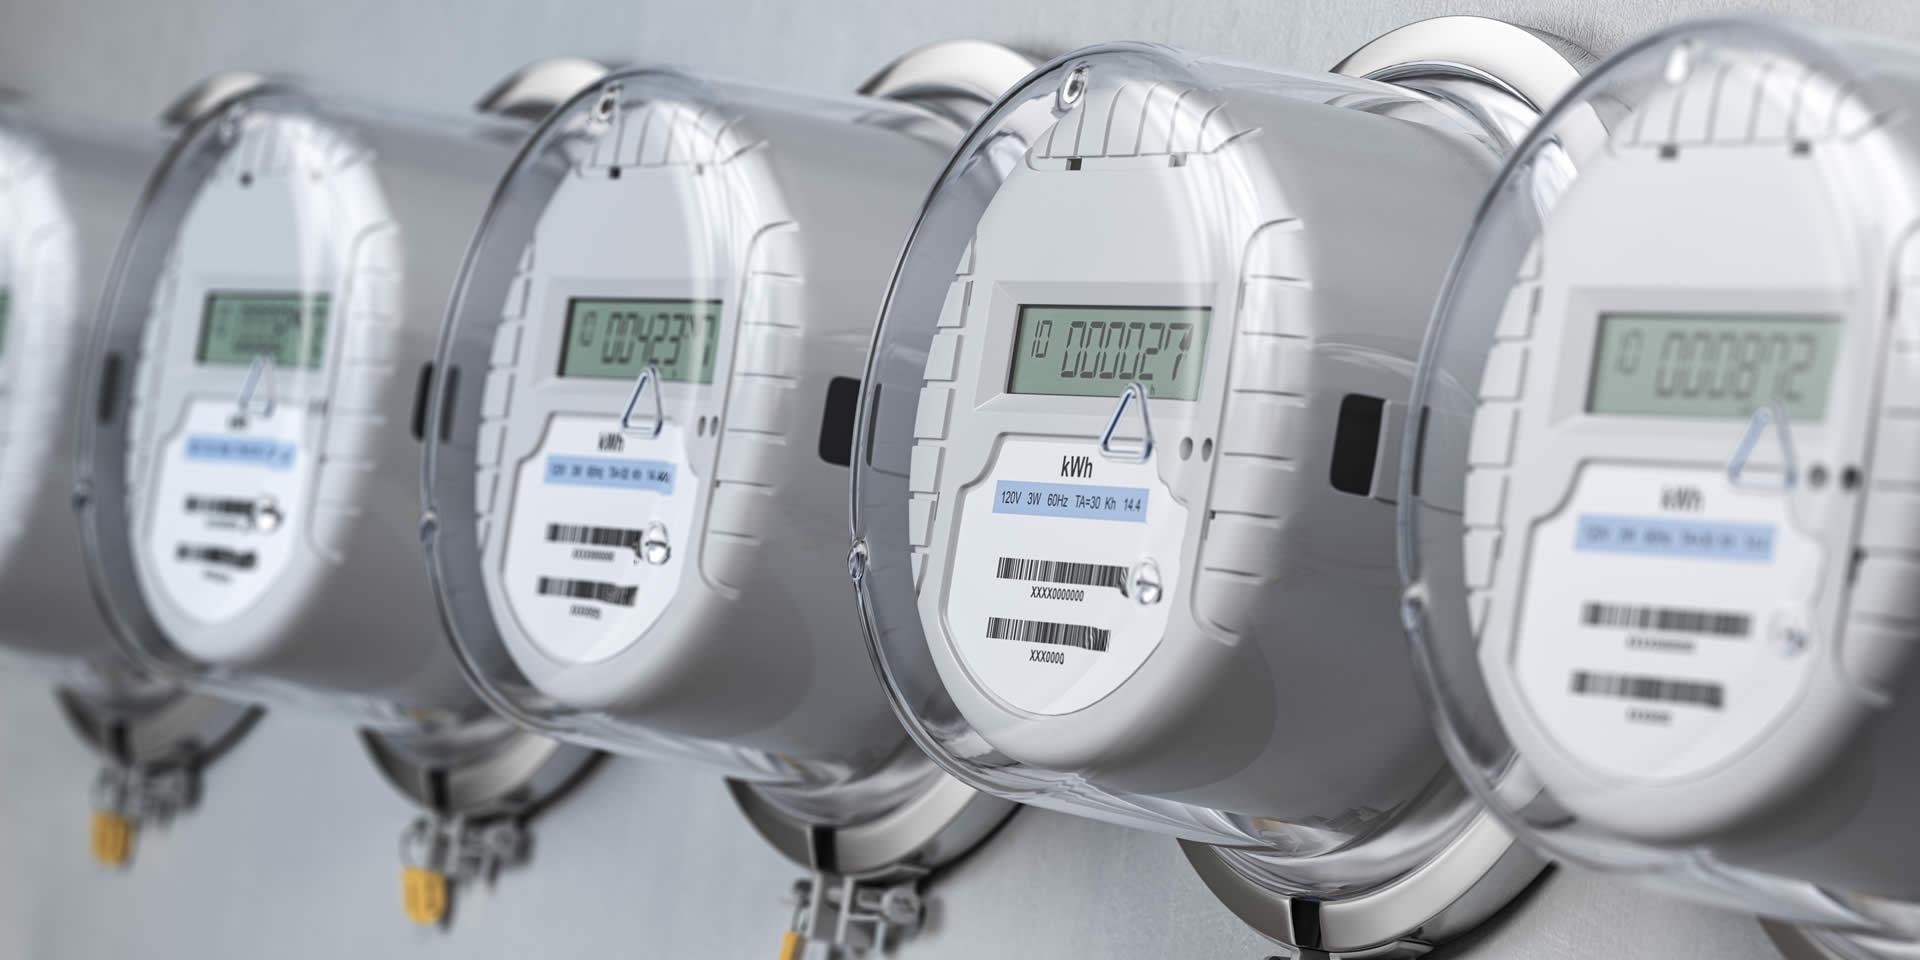 smart meters - it's not all good